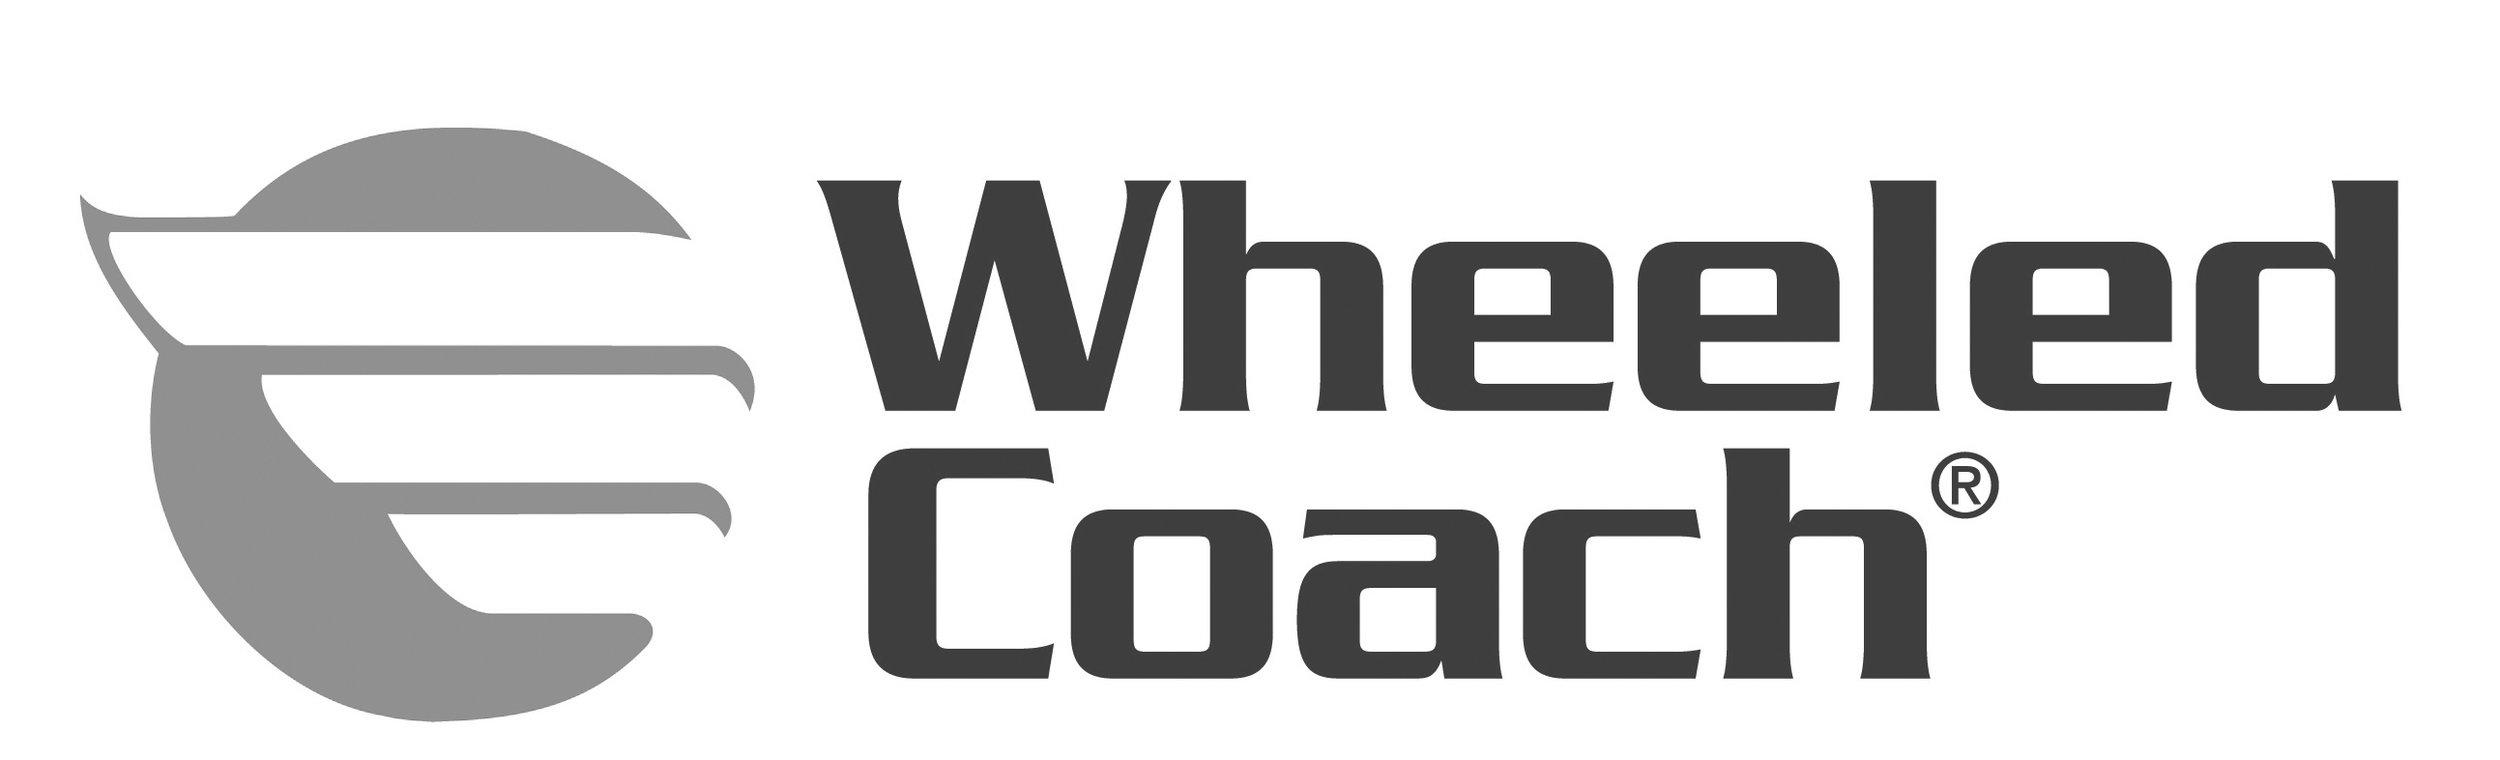 Wheeled-Coach-Desaturated.jpg